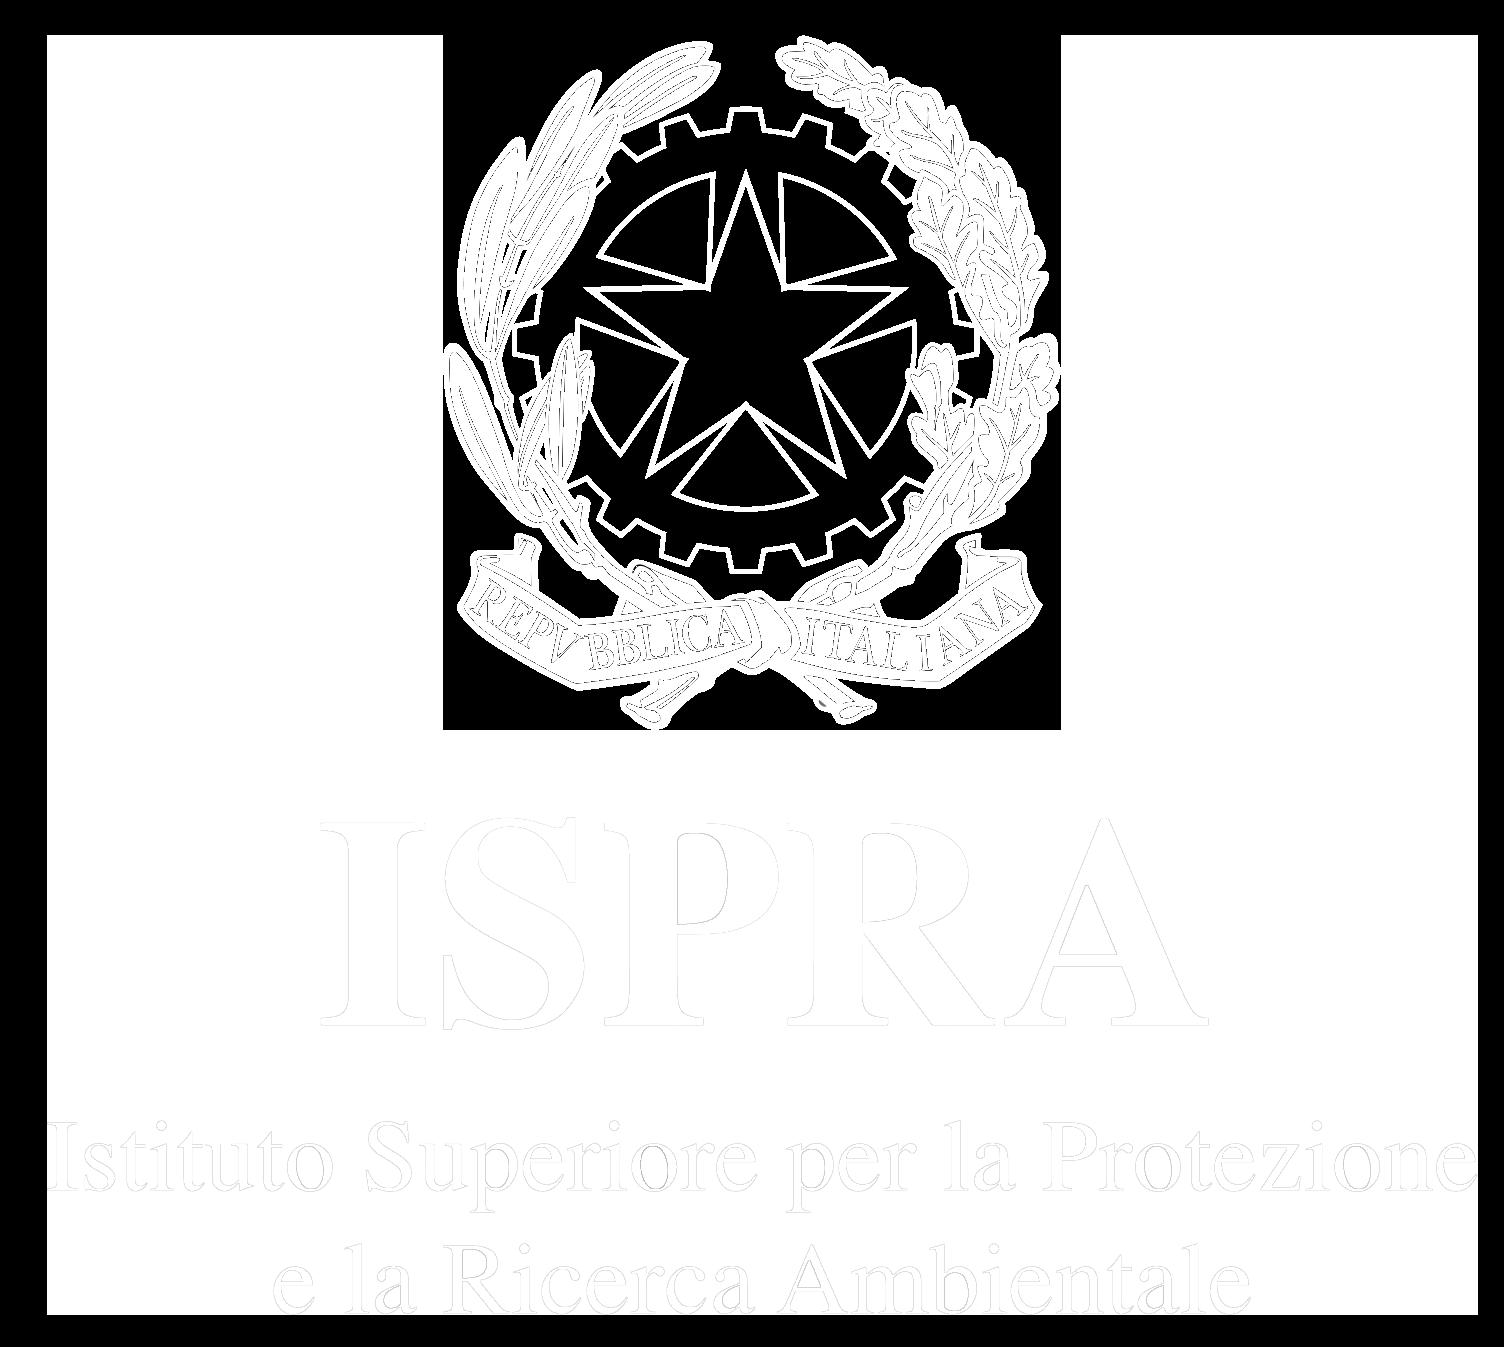 ISPRA